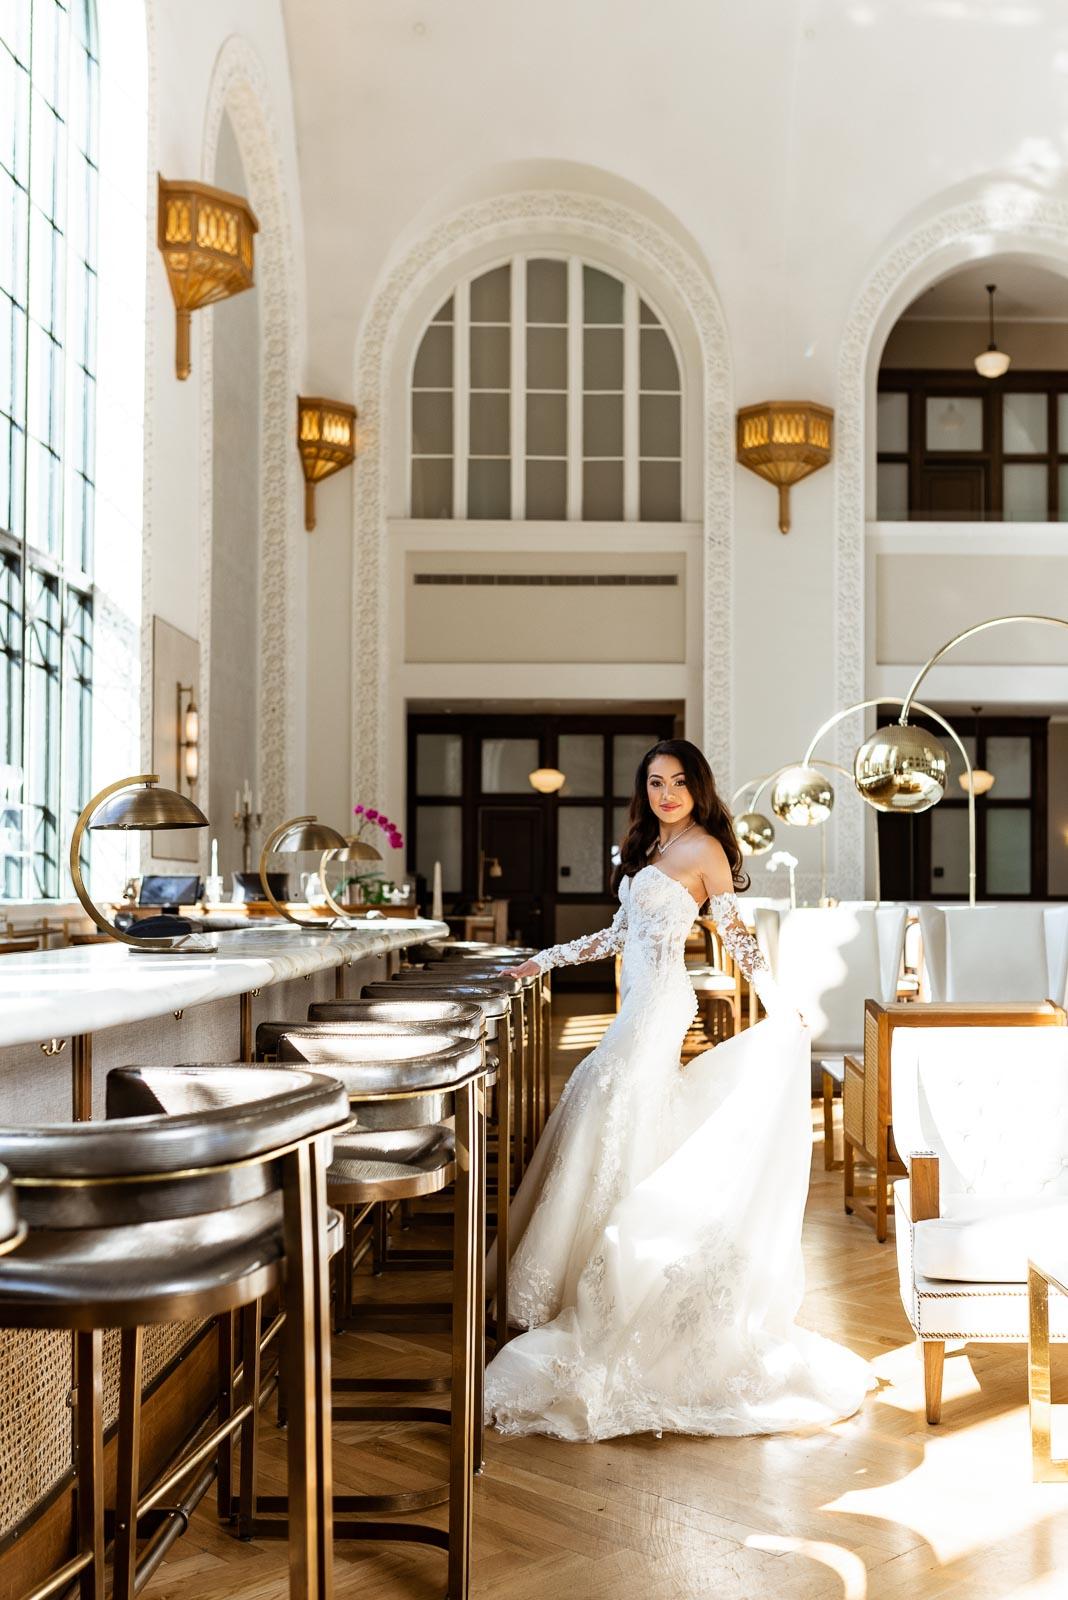 Glamorous Bride Photos | Josie V Photography